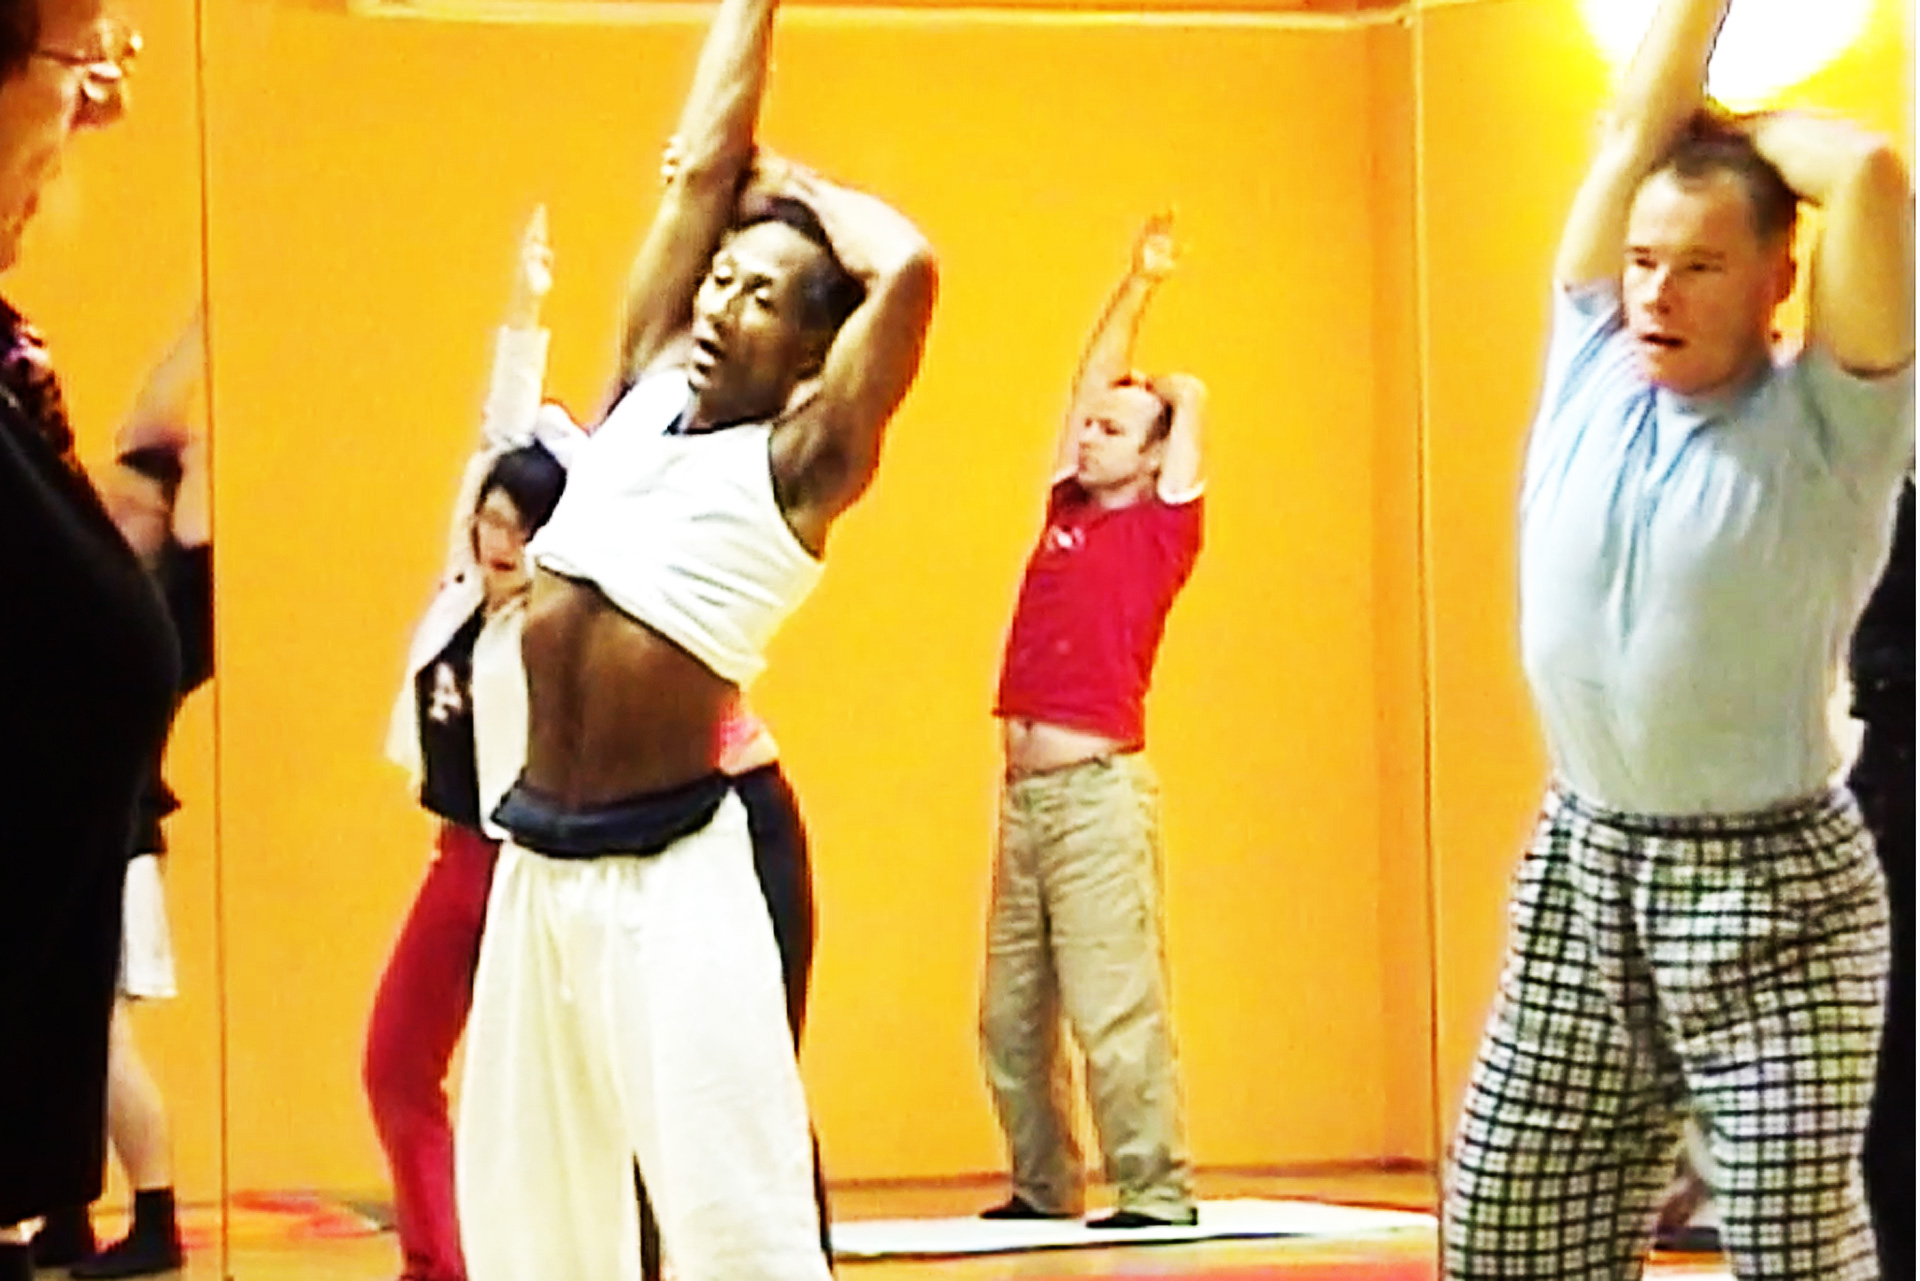 oberer Rücken Entspannung therapeutisch Bewegung Intonation rhythmisches Muster Übung Training Pilates Körperachtsamkeit